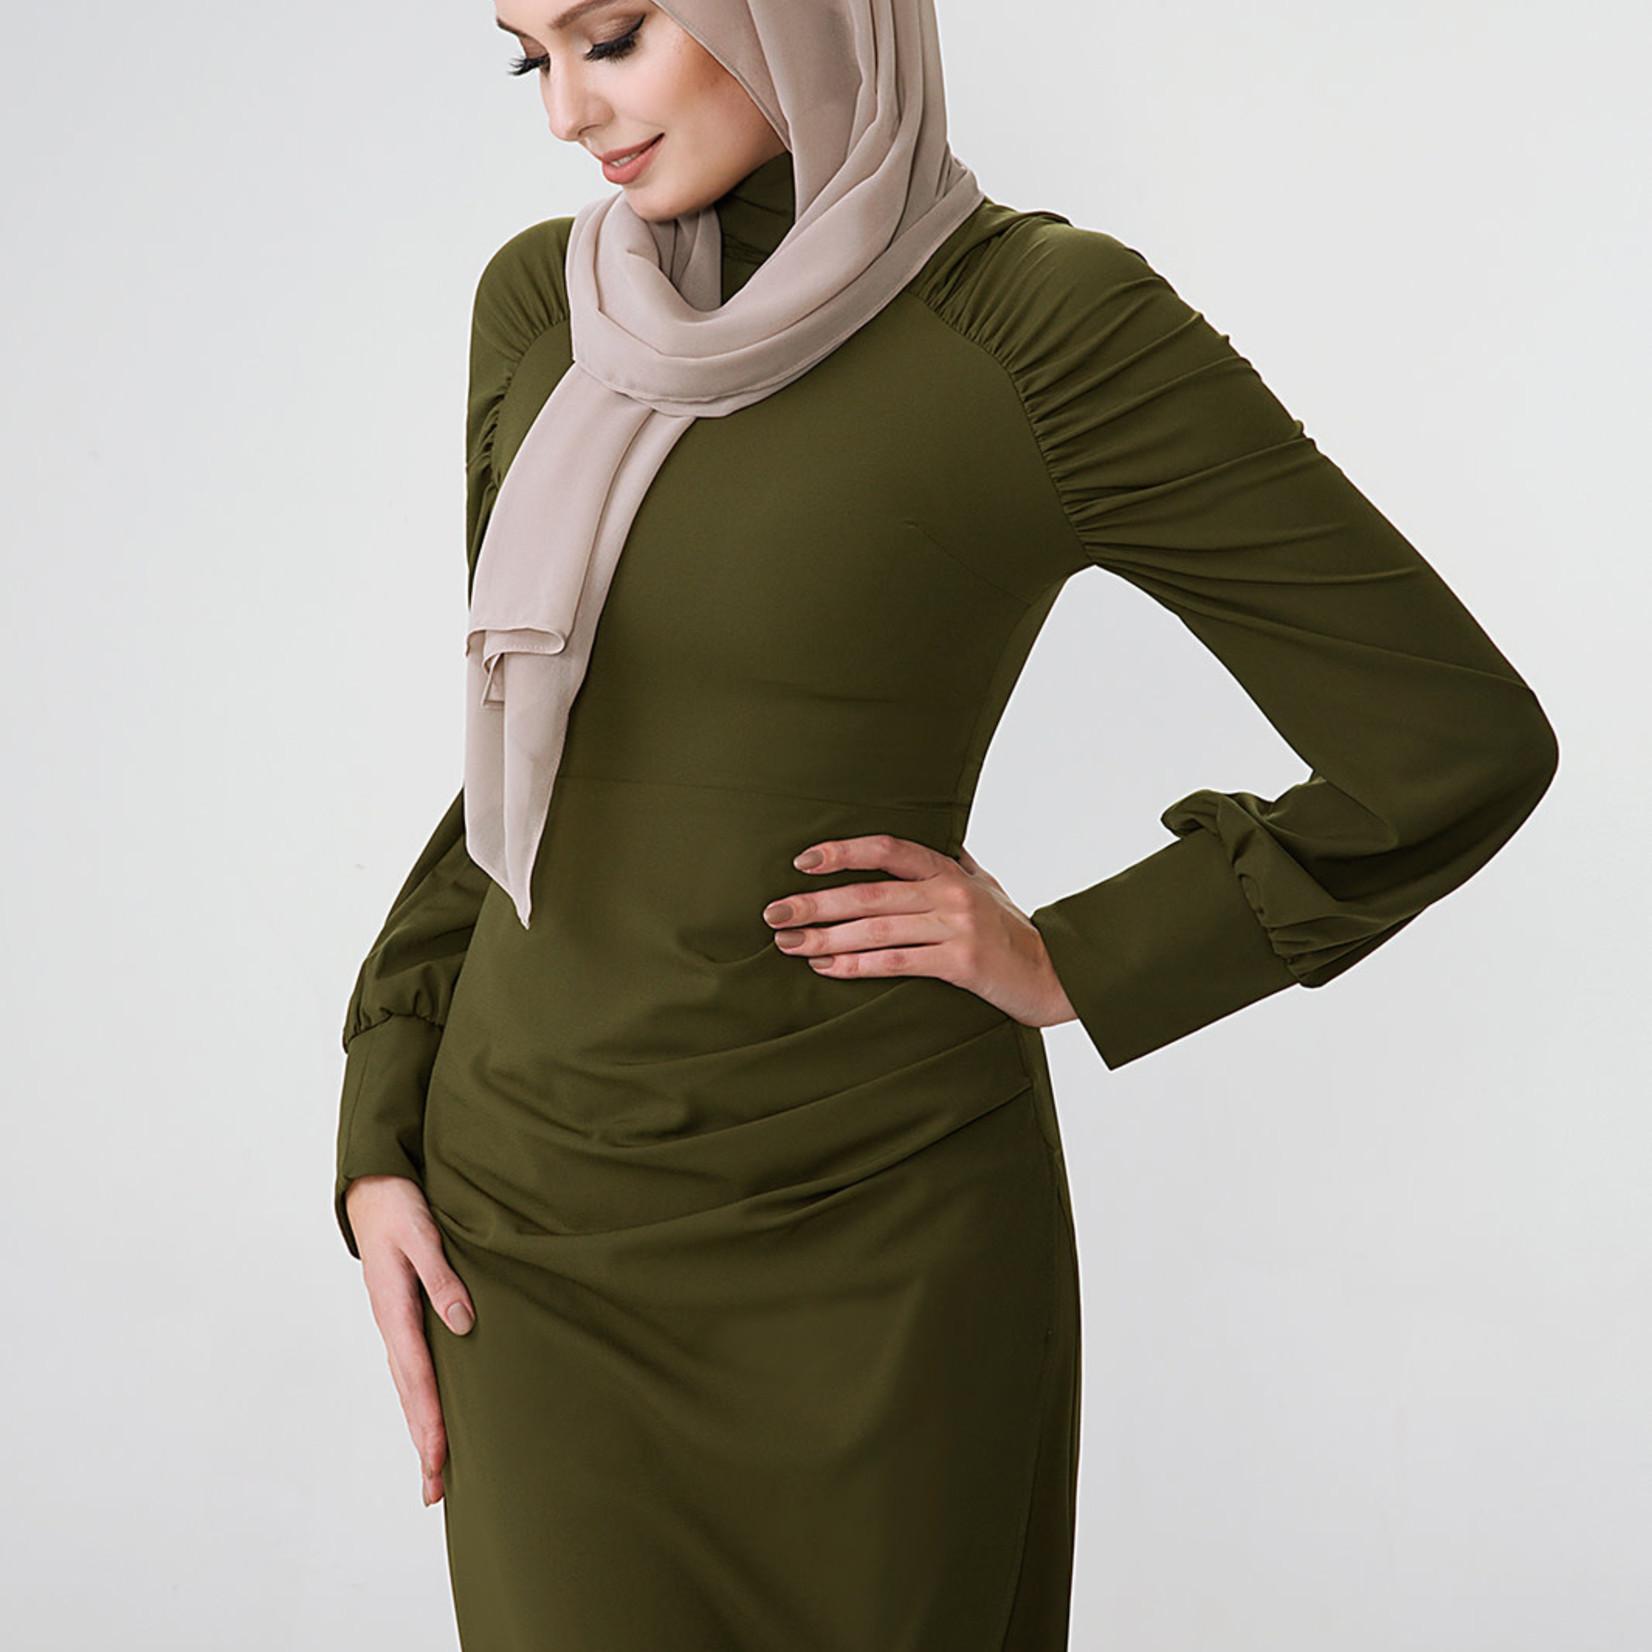 Hijab House Khaki Puff Sleeve Dress